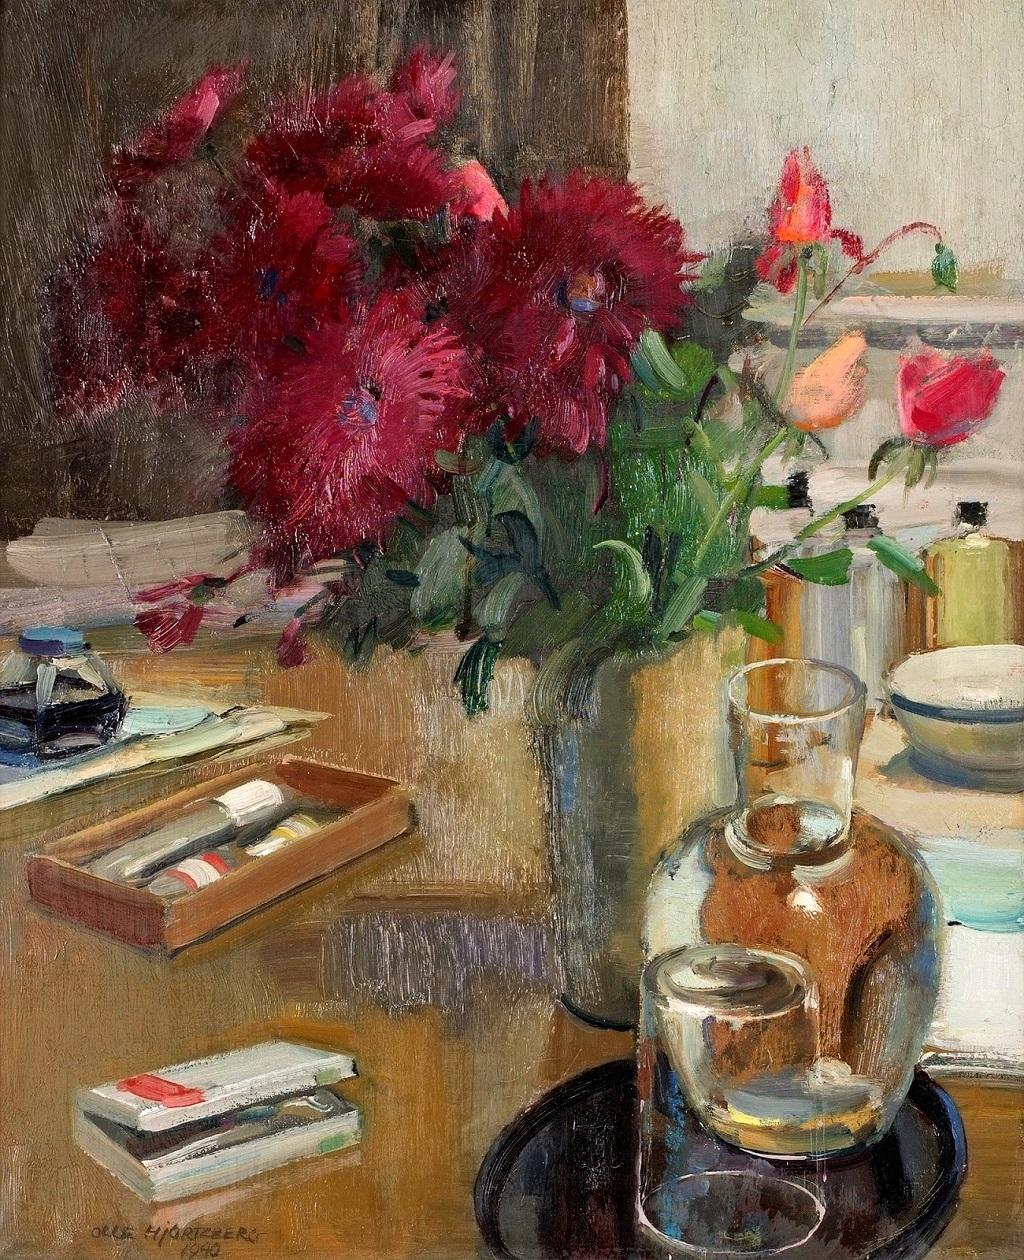 29- 1940_Натюрморт с цветами_61 x 50_х.,м._Частное собрание.jpg